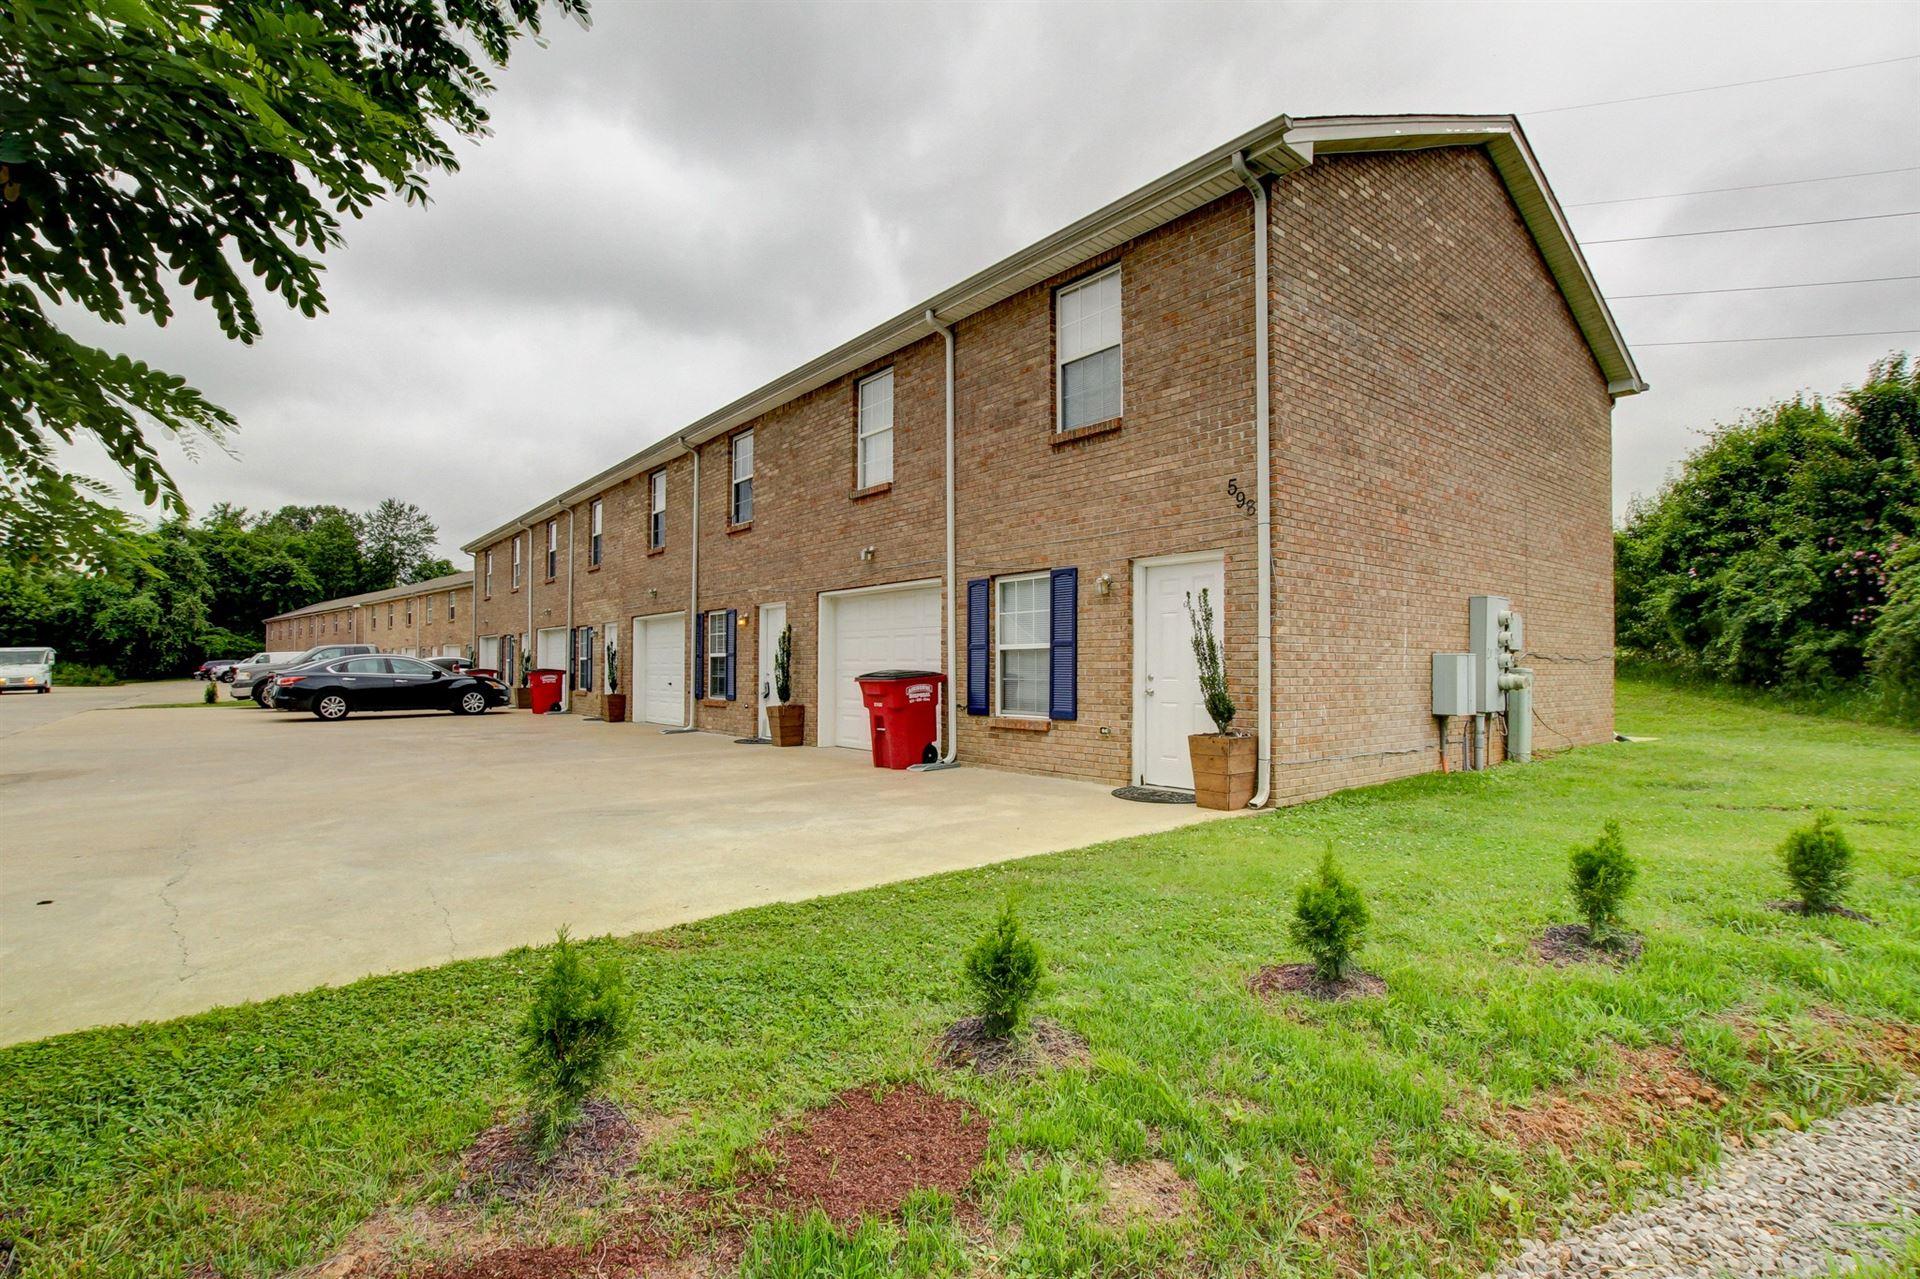 598 Cory Dr, Clarksville, TN 37040 - MLS#: 2261964